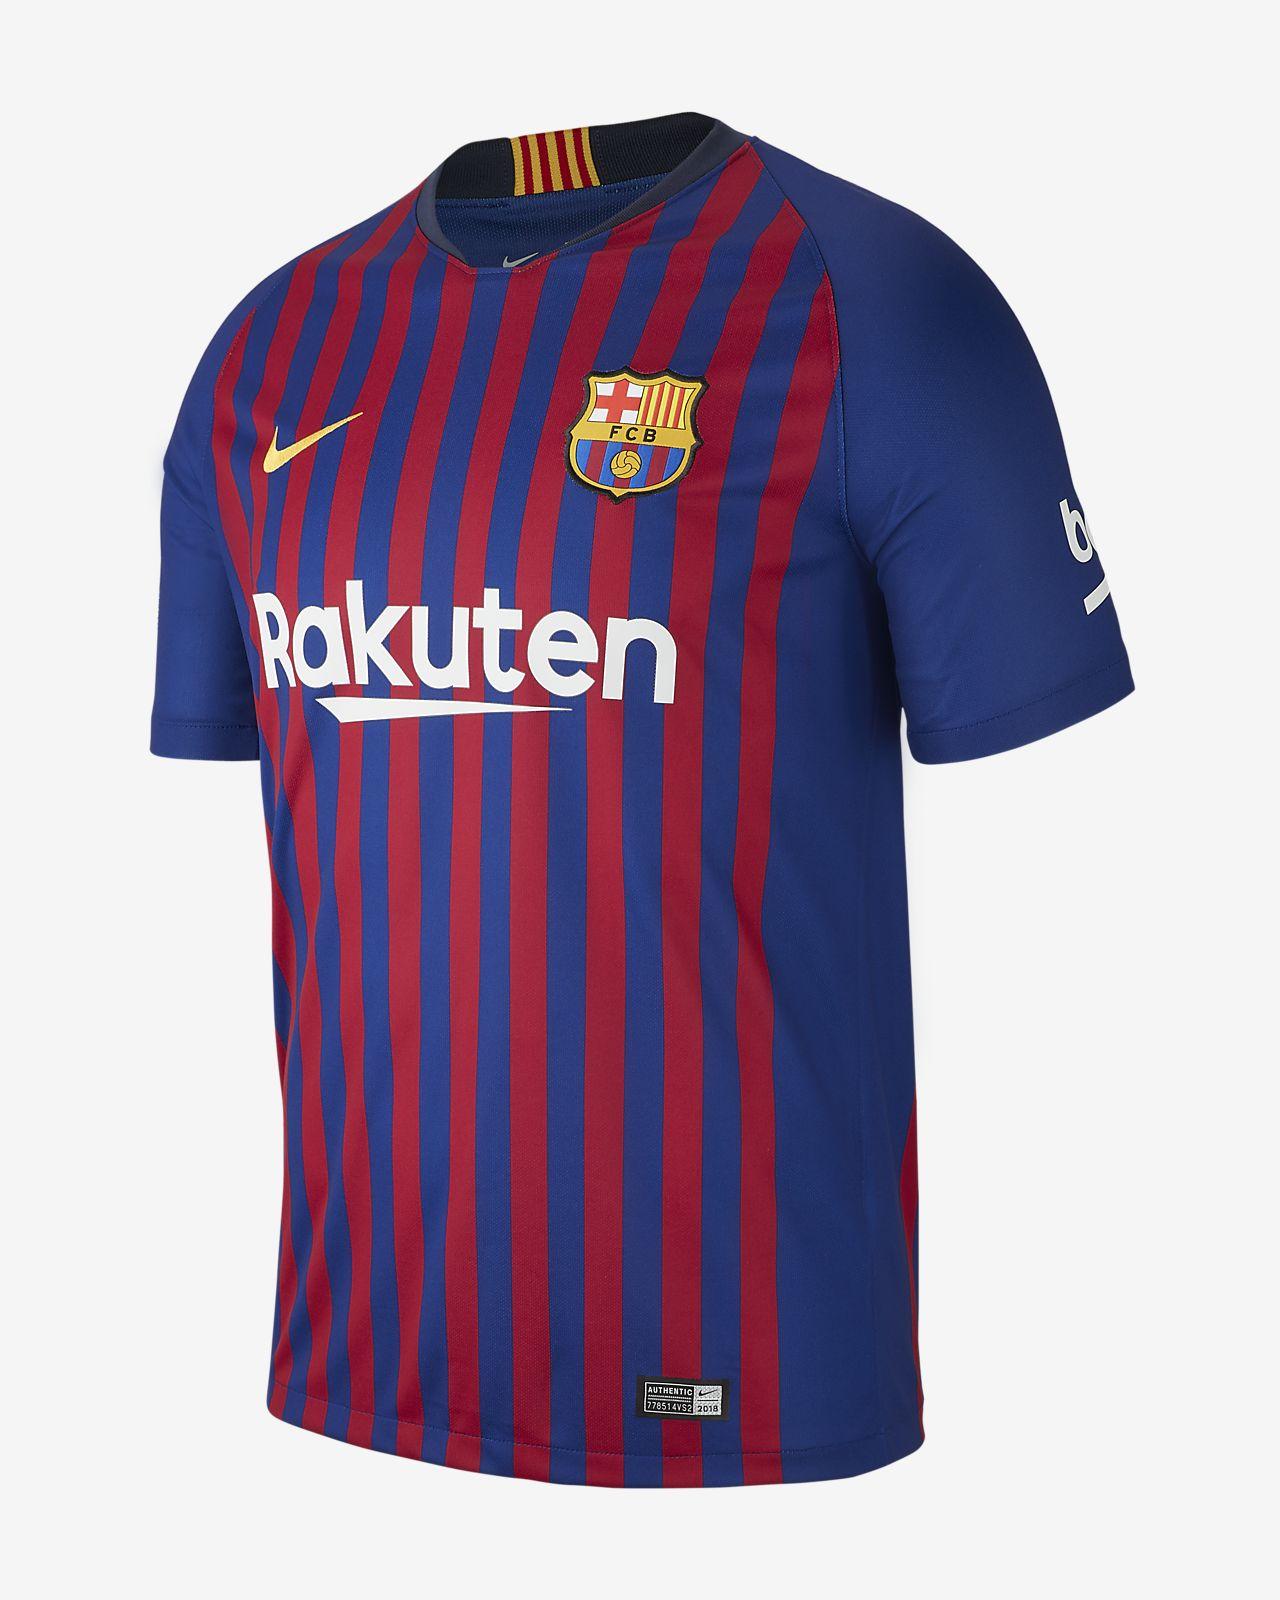 b4e89f69d 2018 19 Nike Fc Barcelona - Querciacb